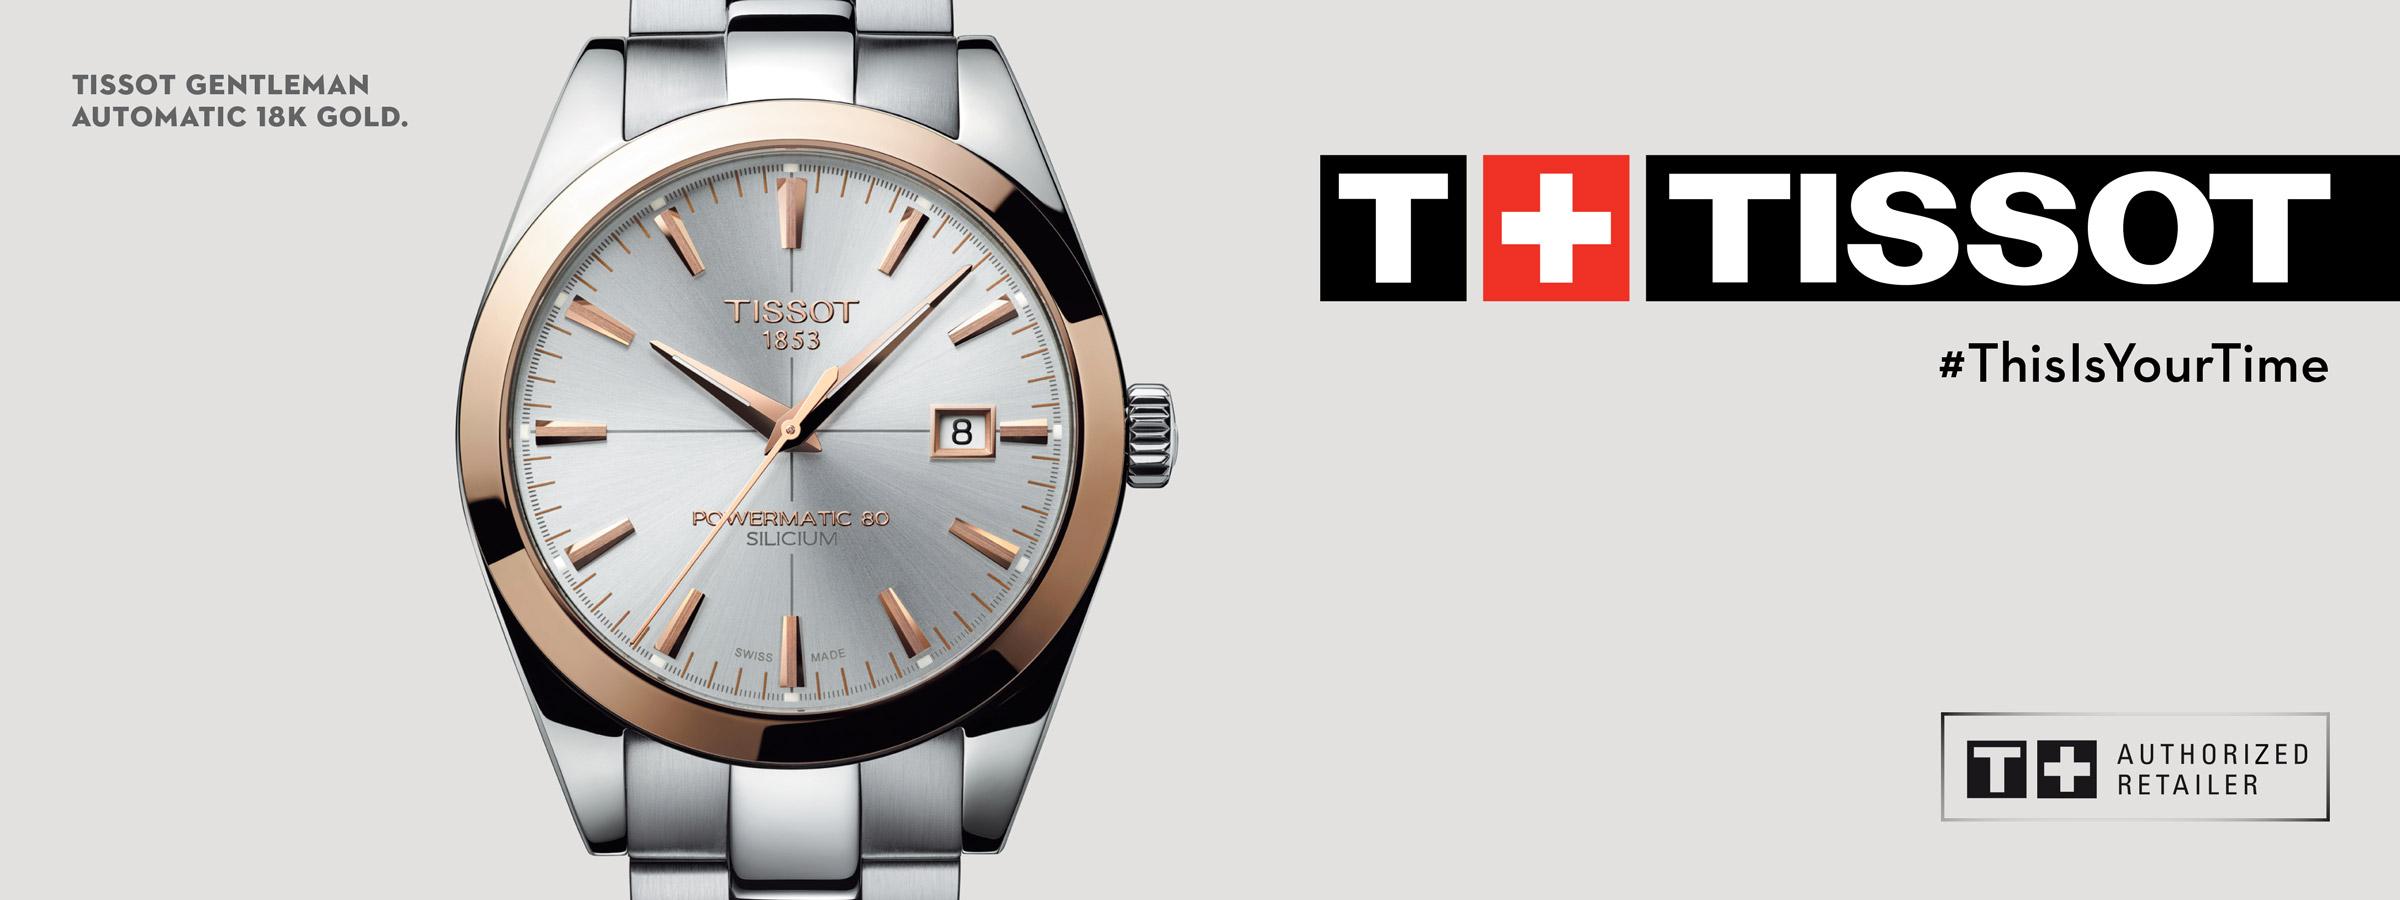 Tissot Watches - Graziella Fine Jewellery